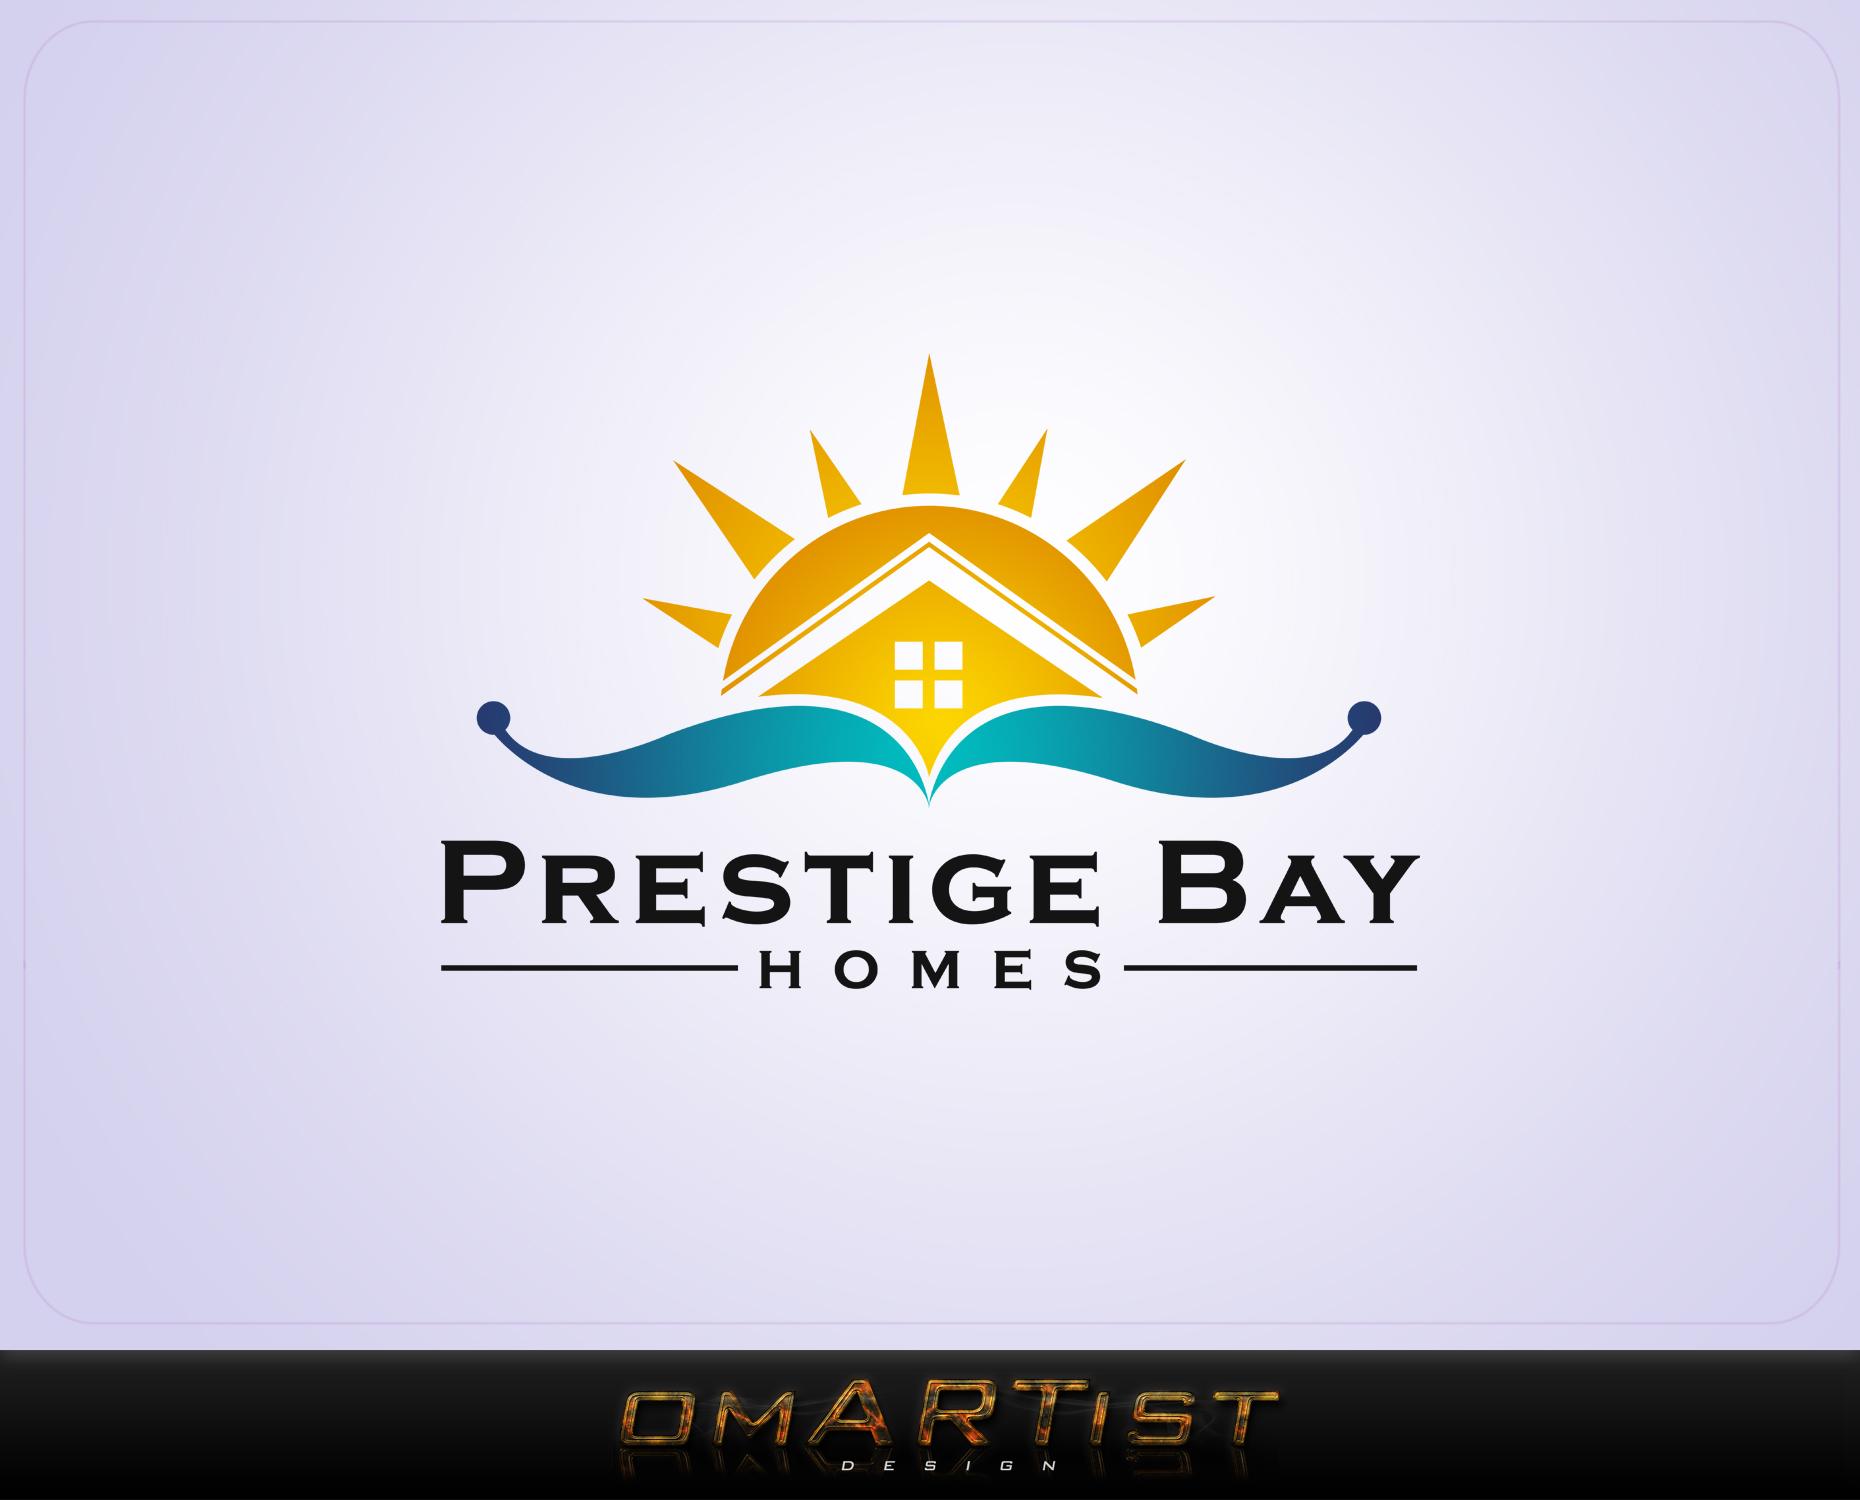 Logo Design by omARTist - Entry No. 141 in the Logo Design Contest Imaginative Logo Design for Prestige Bay Homes.